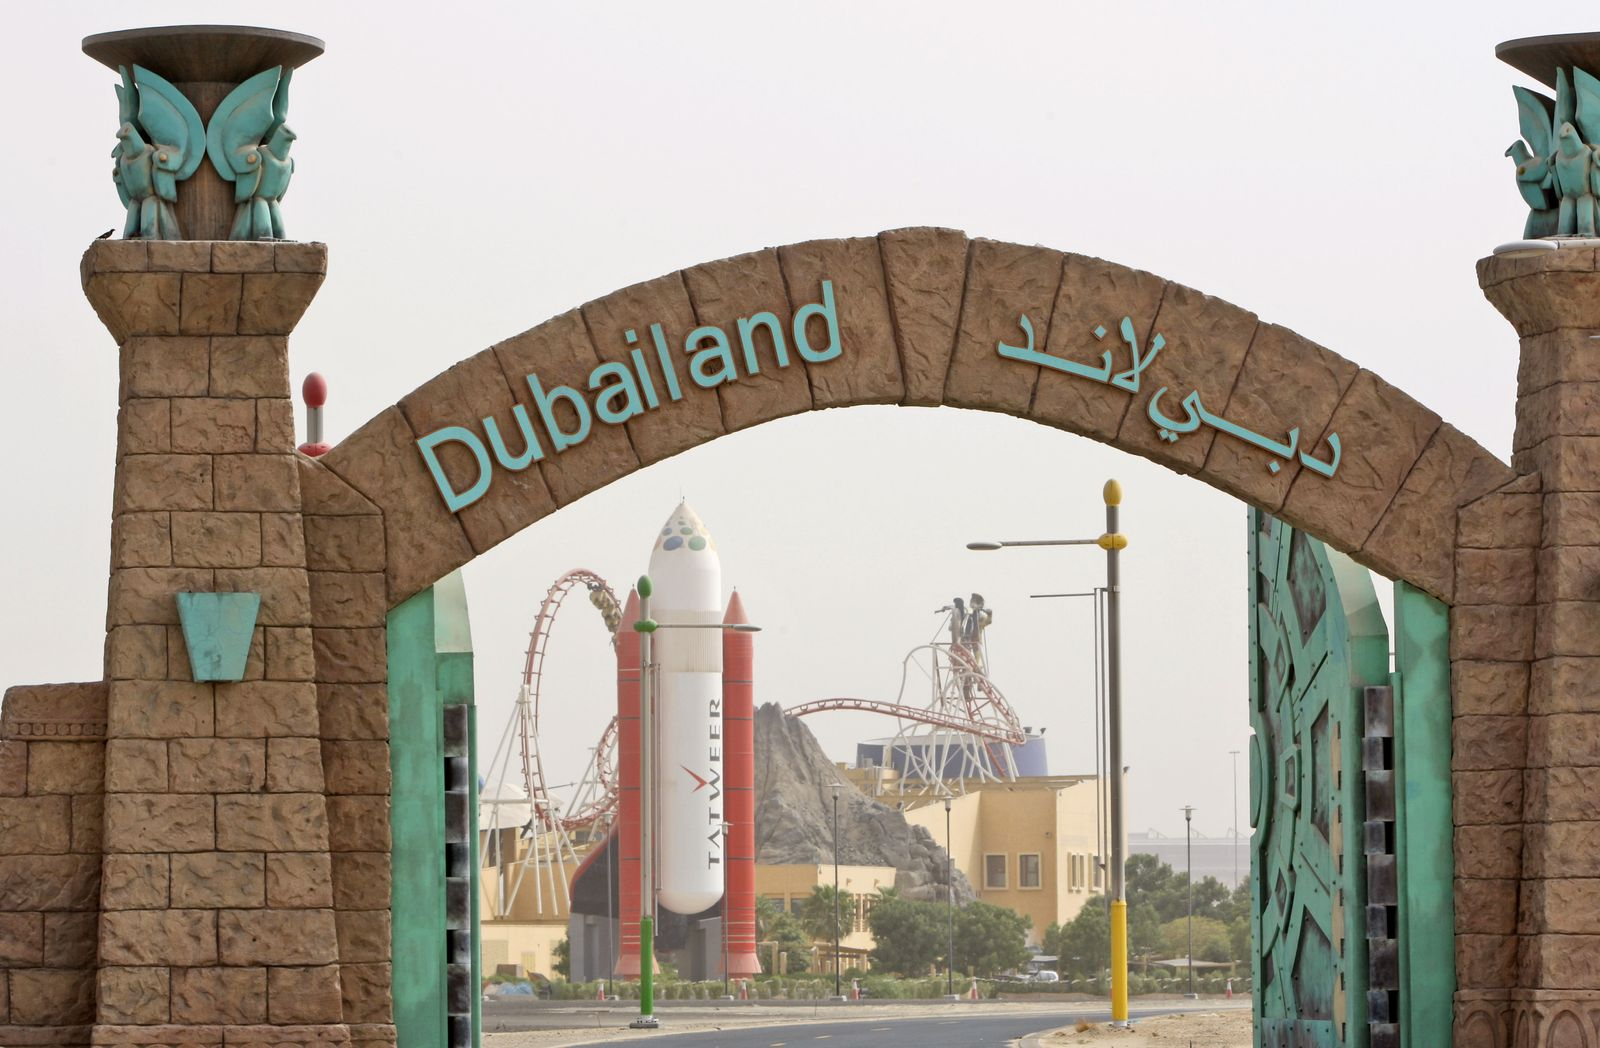 Dubailand Dreaming